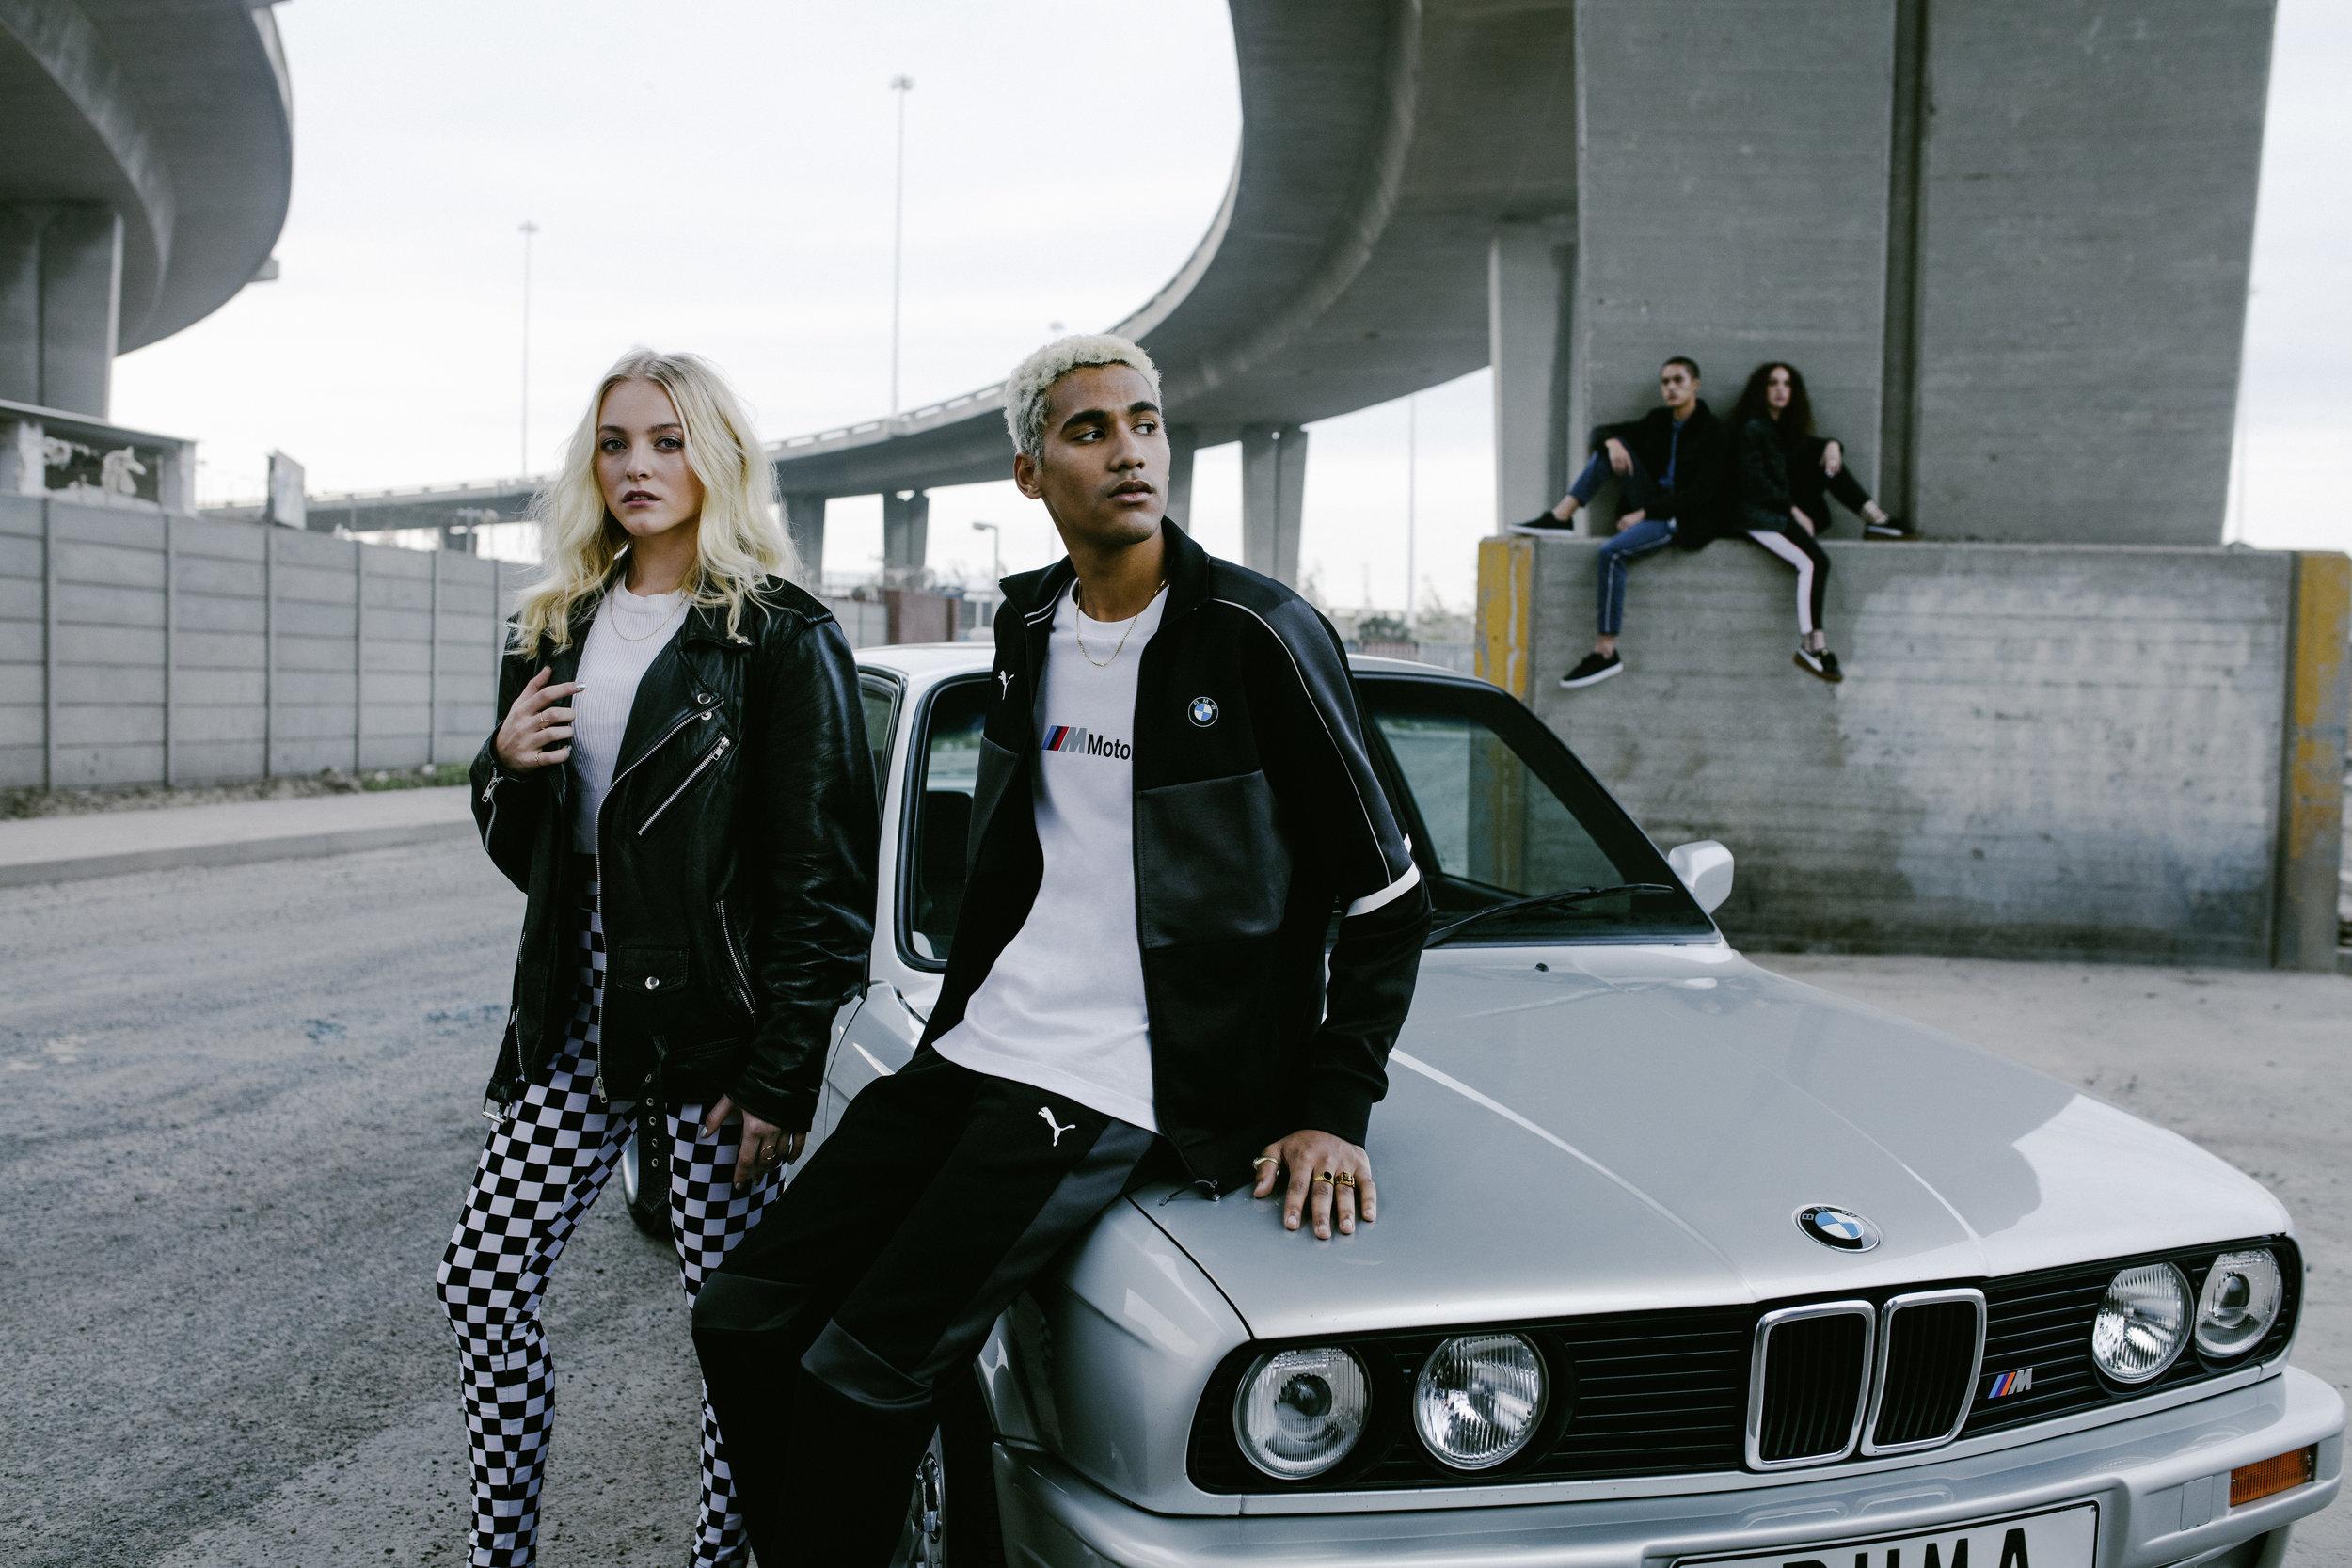 19SS_xMS_BMW_Model-Product_T7-Track-Jacket_00057_RGB.jpg